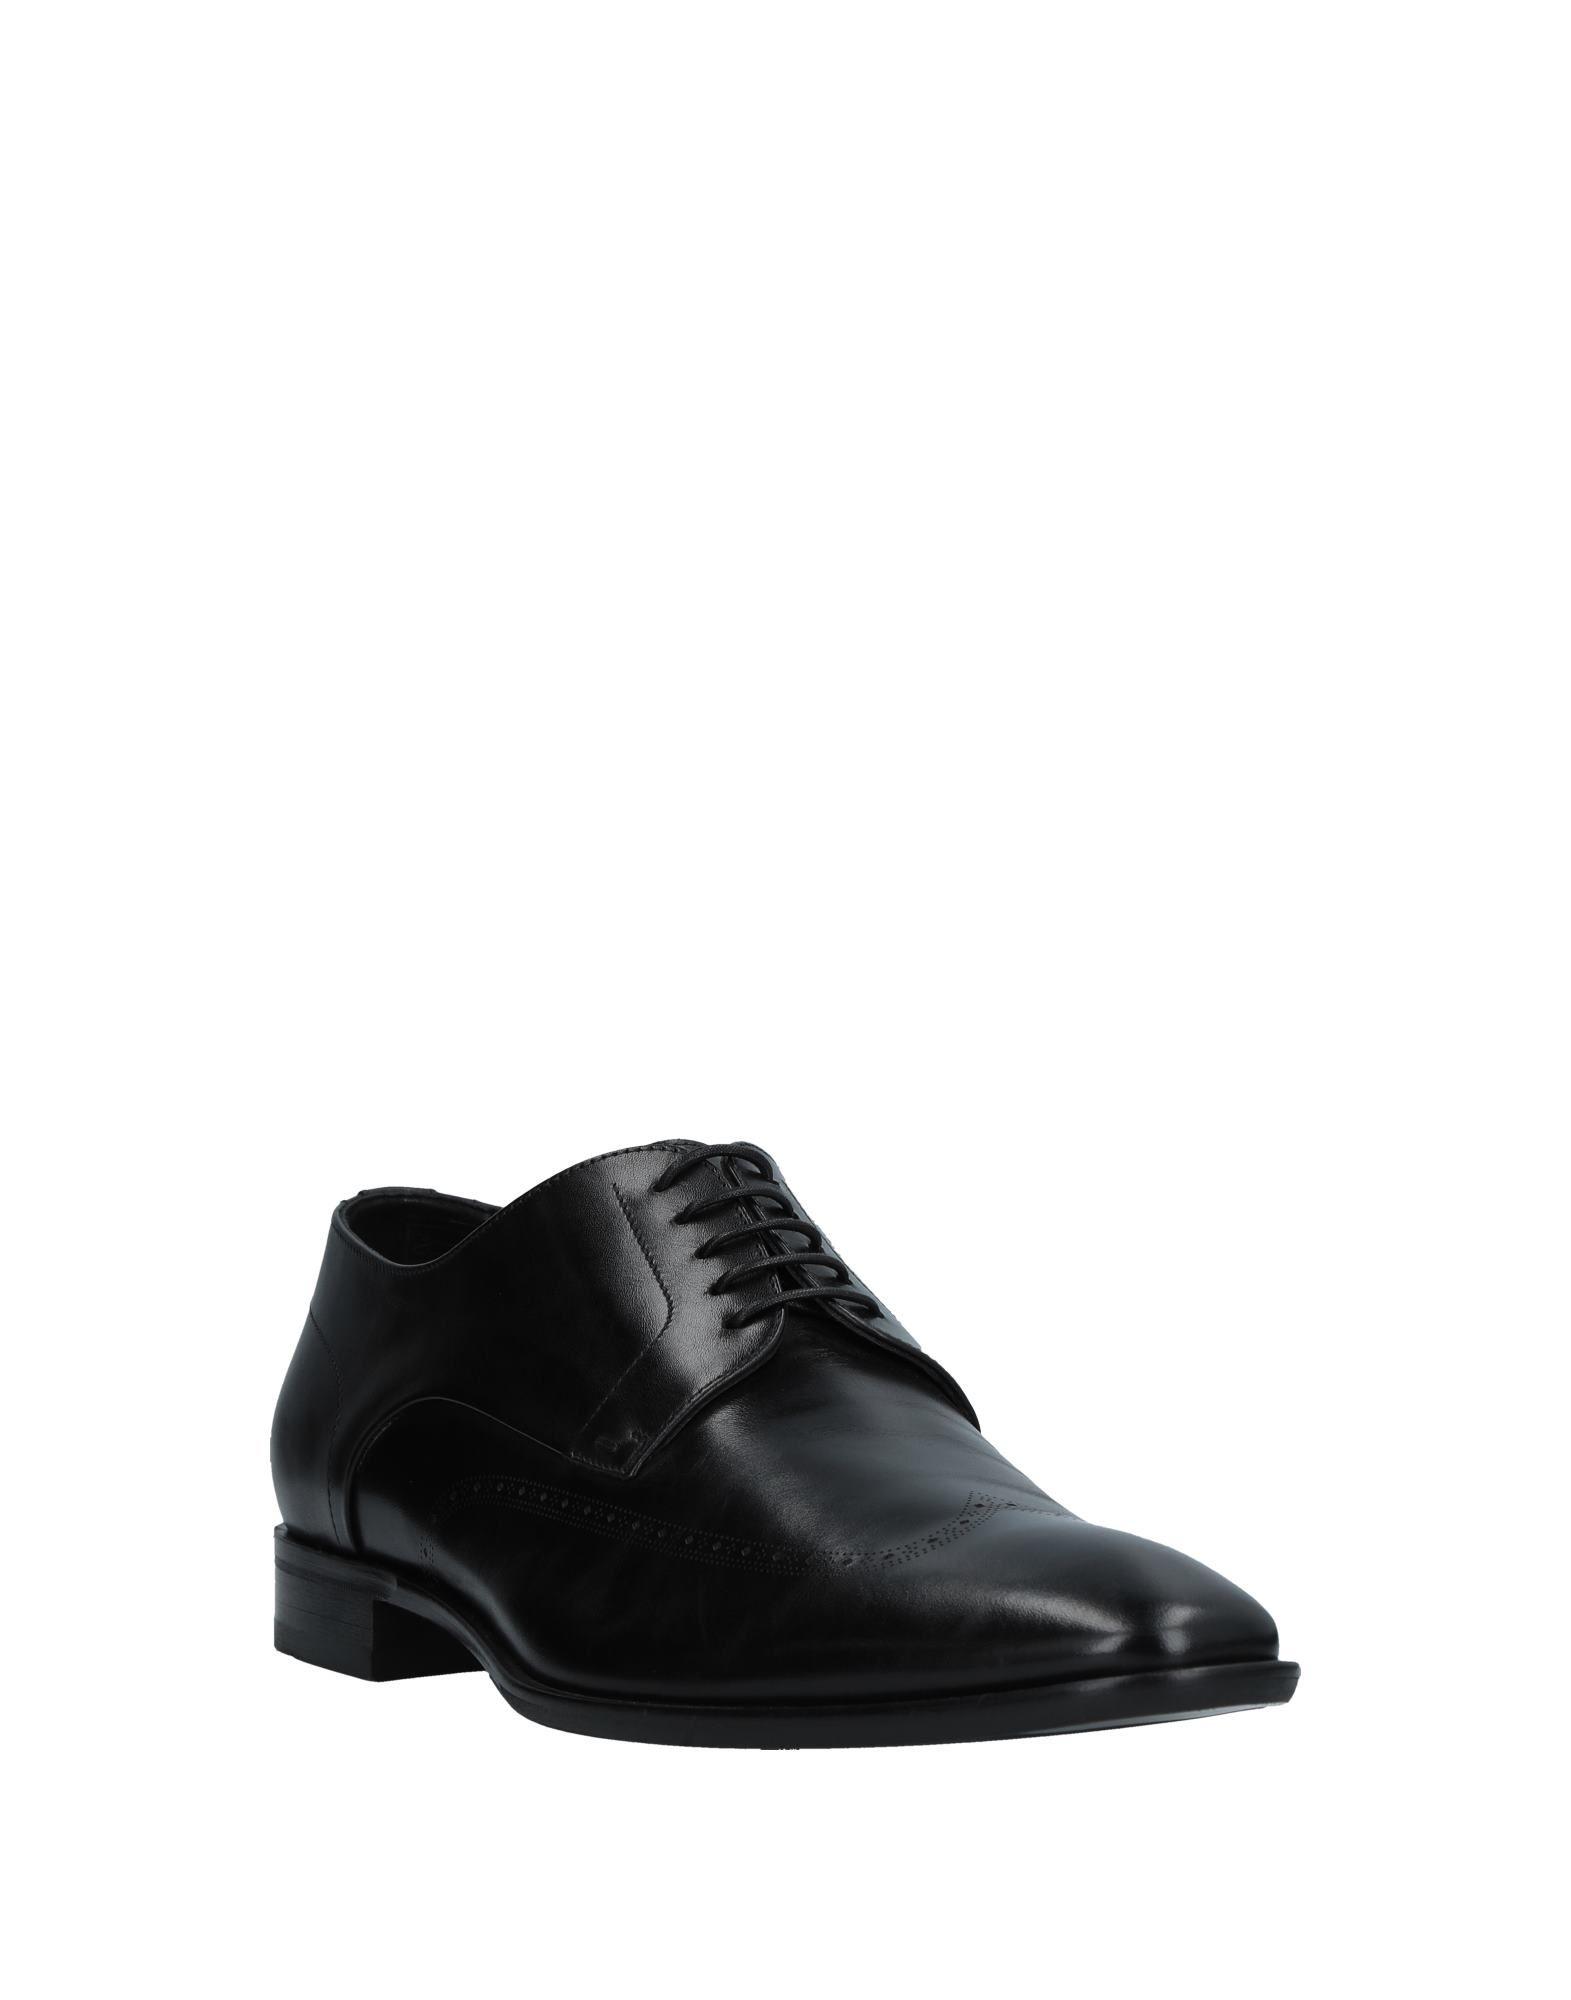 Boss Black Schnürschuhe Herren  11521528WM Neue Schuhe